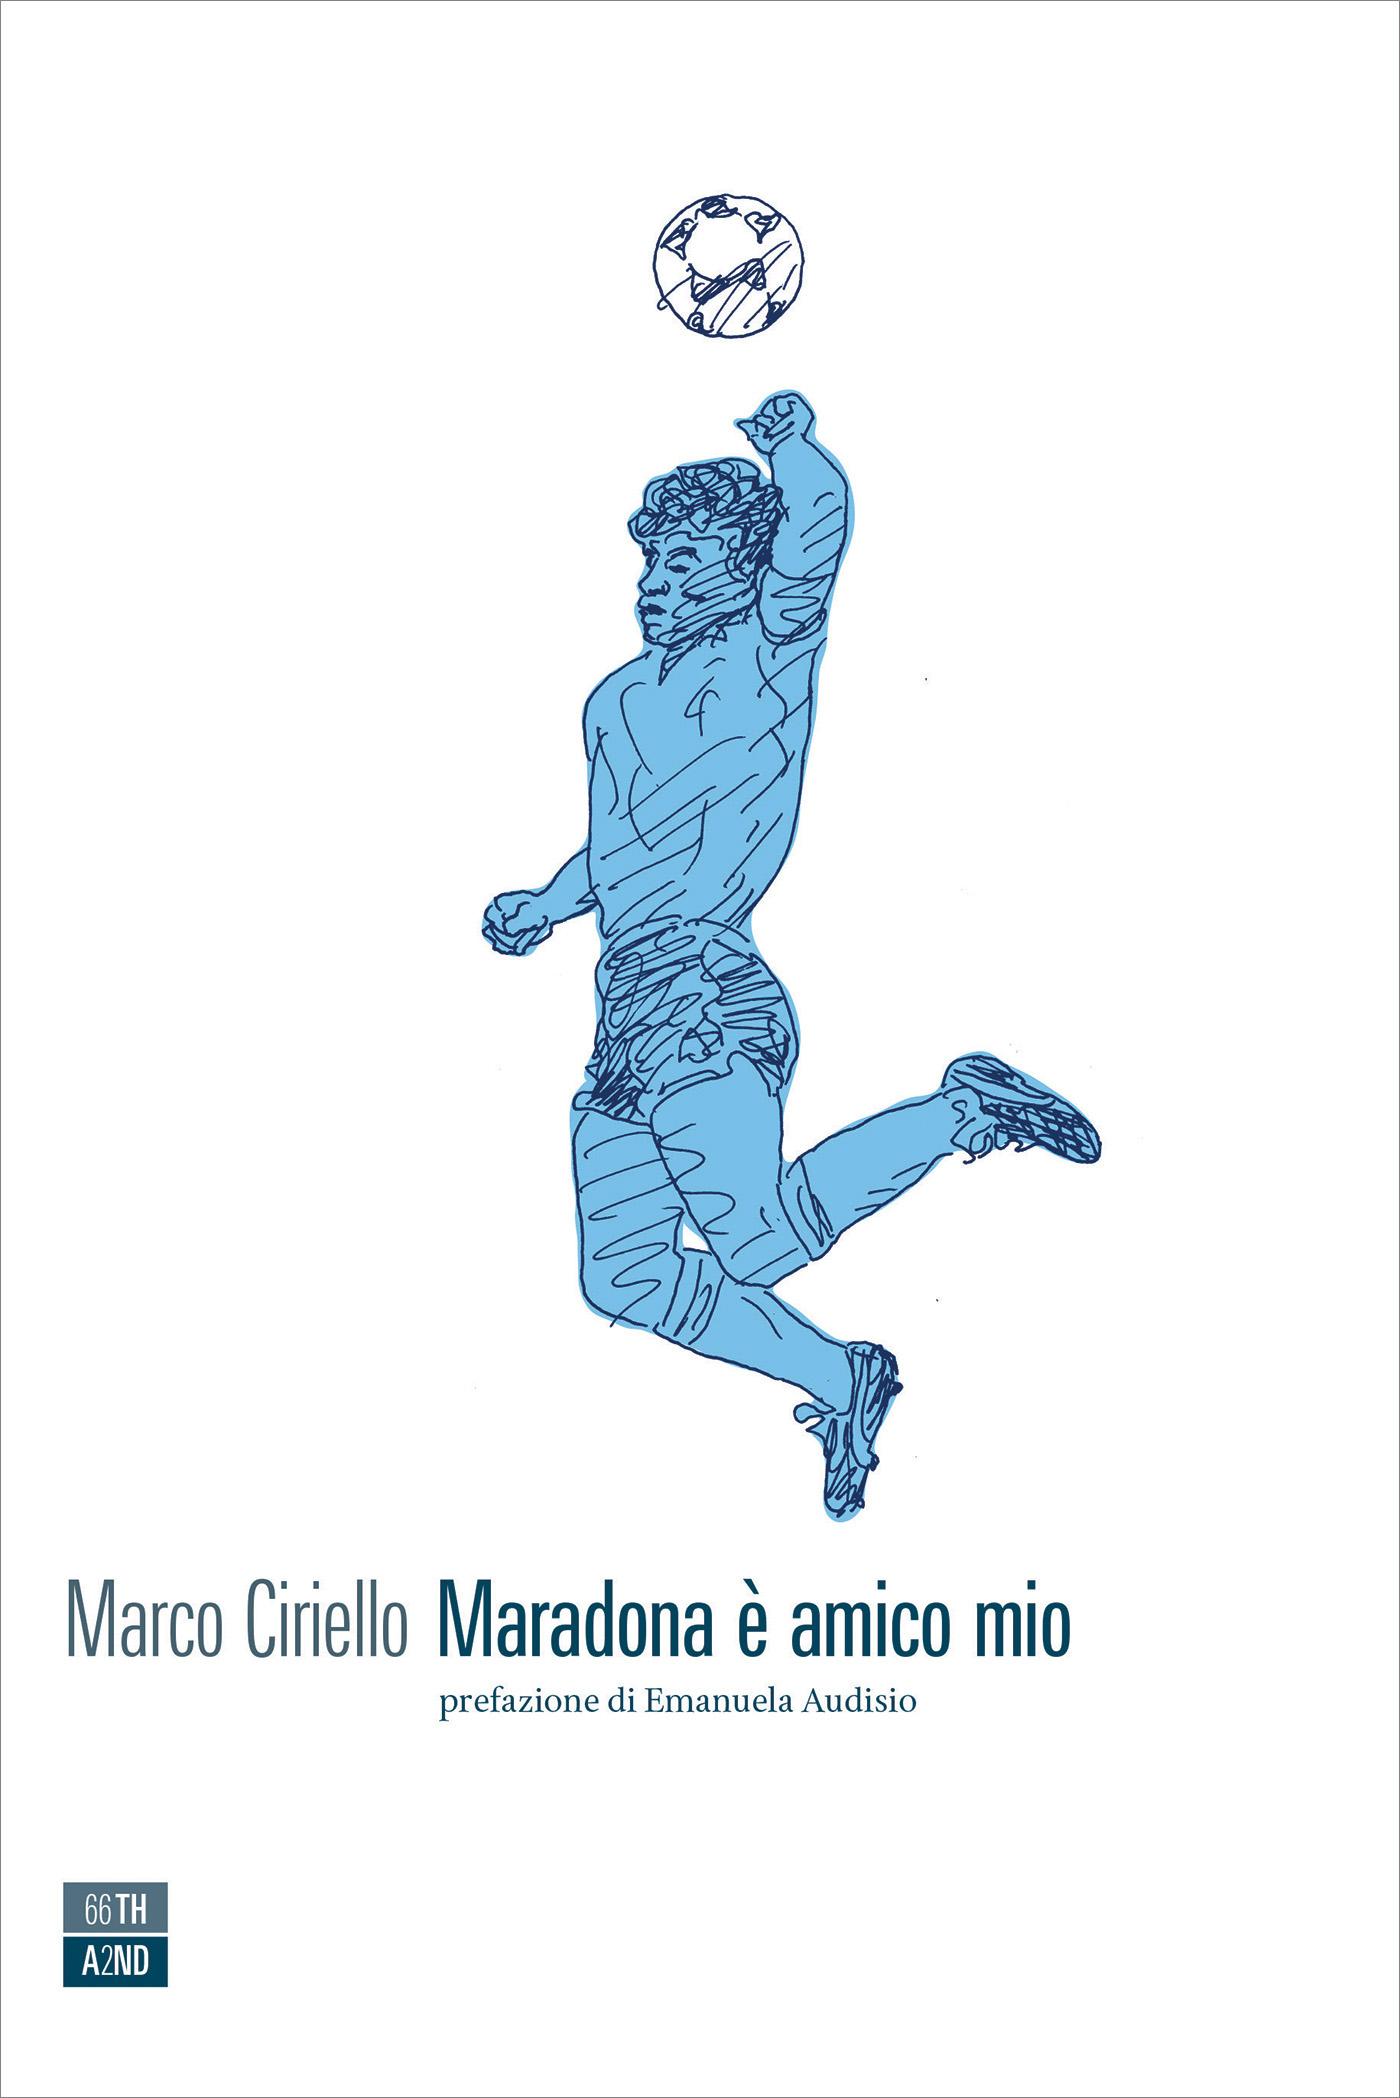 Maradona è amico mio (Maradona is a friend of mine)